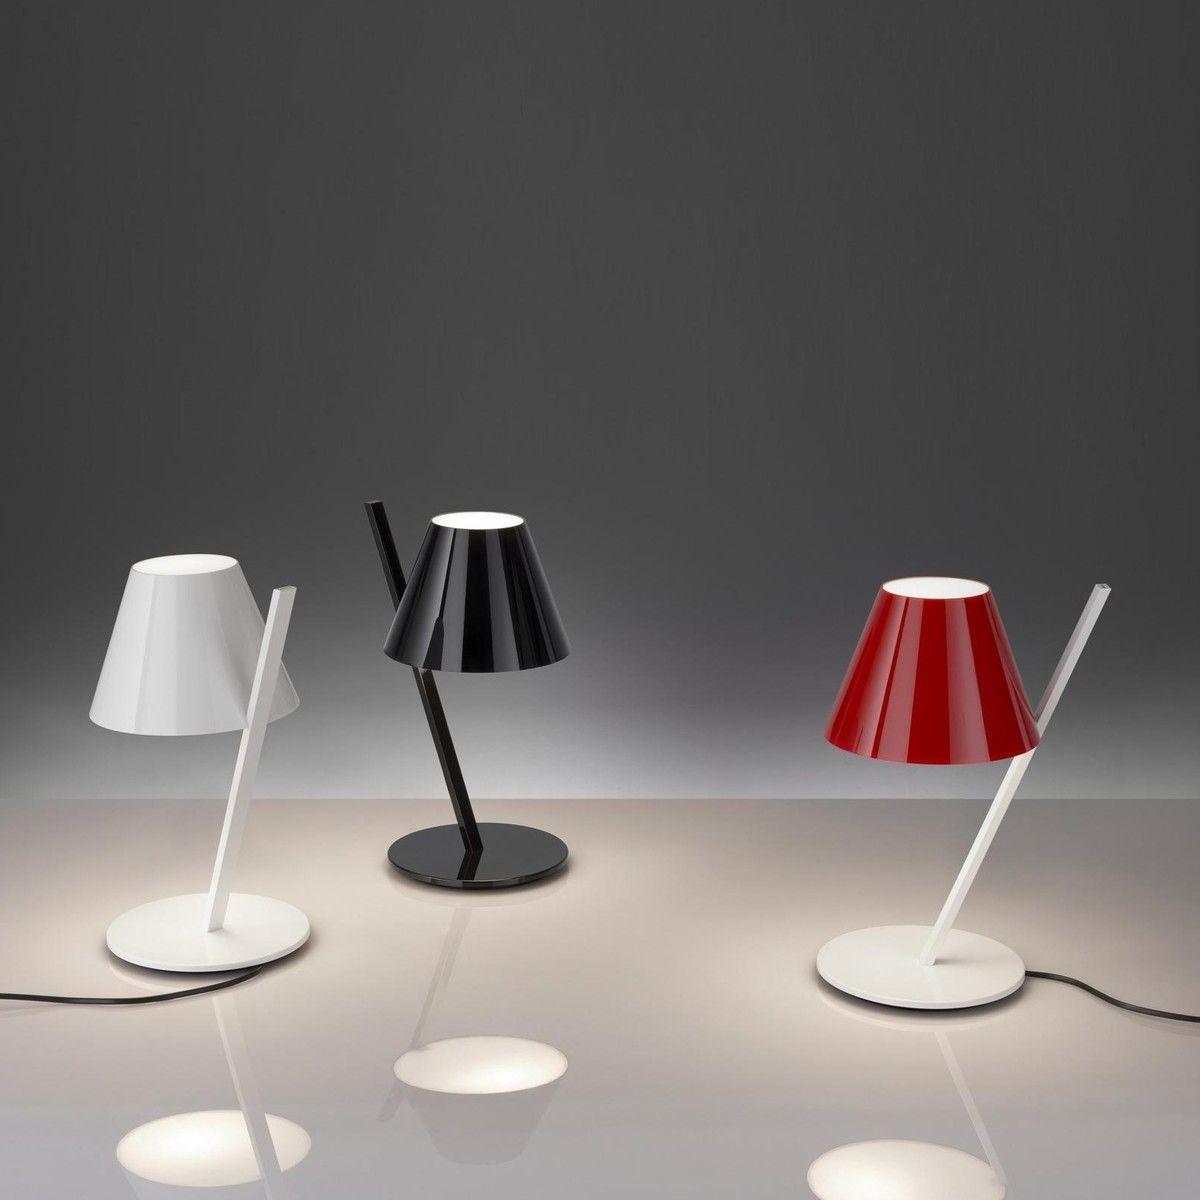 La petite led lampe de table artemide for Artemide lampe